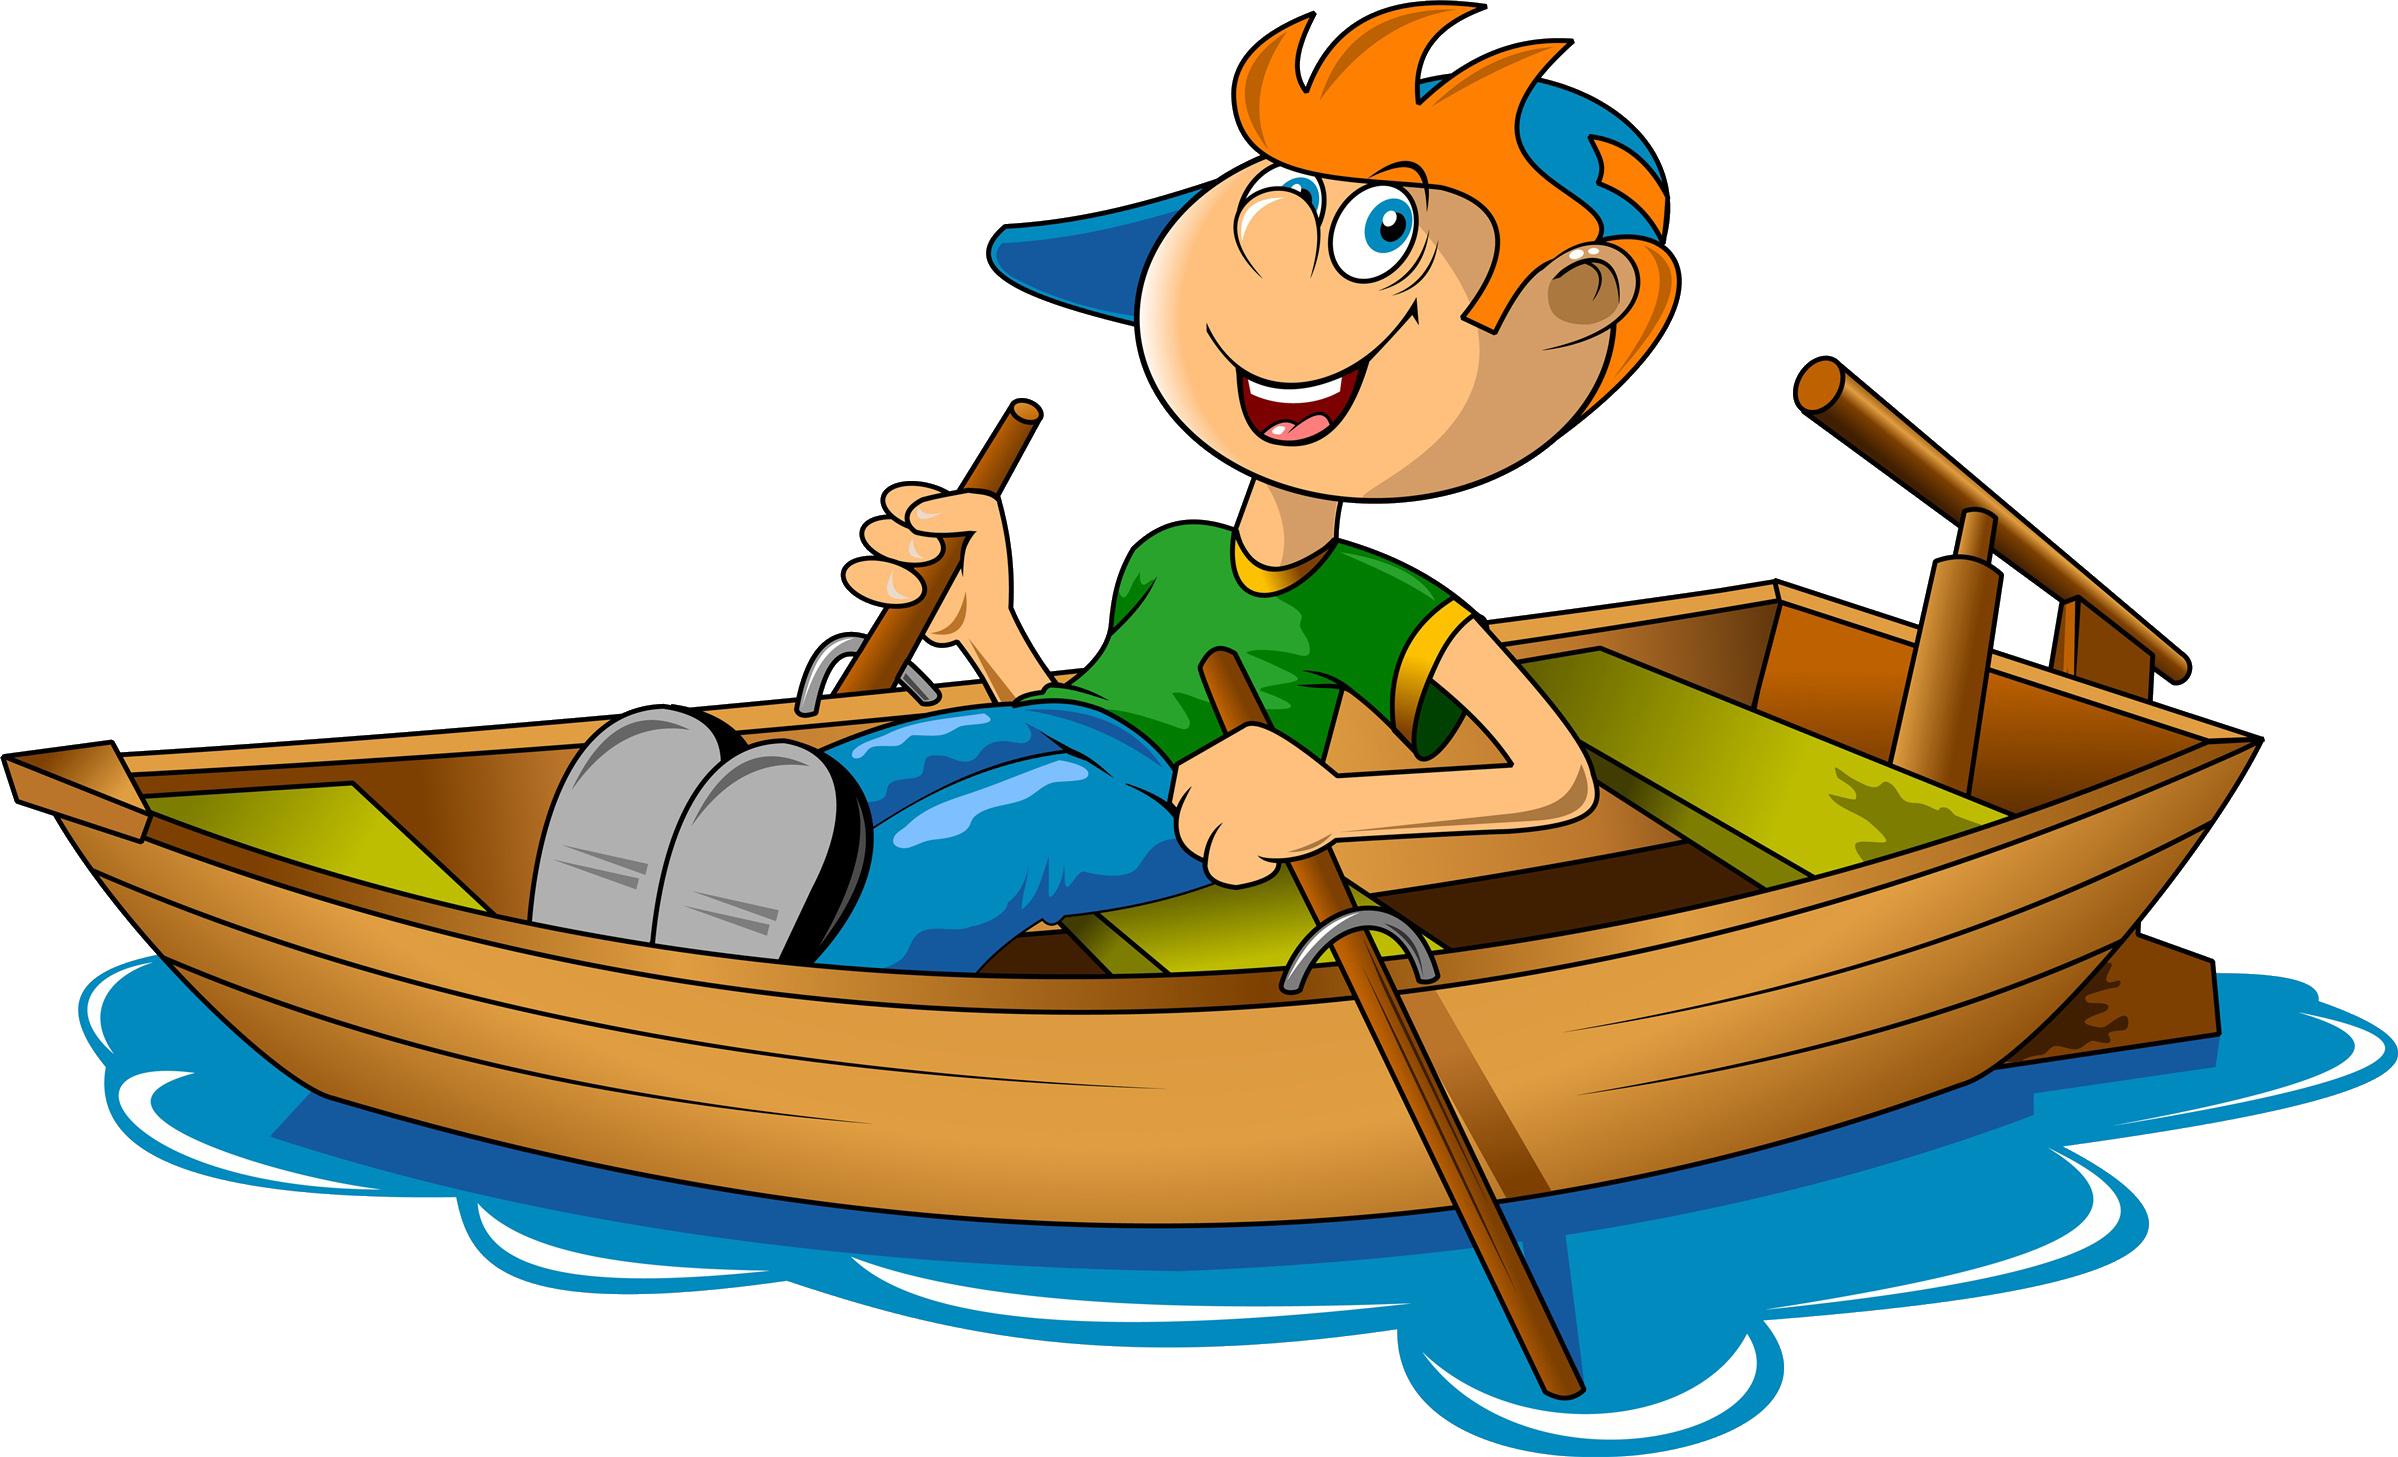 Rowing canoe clip art. Clipart boat water transport